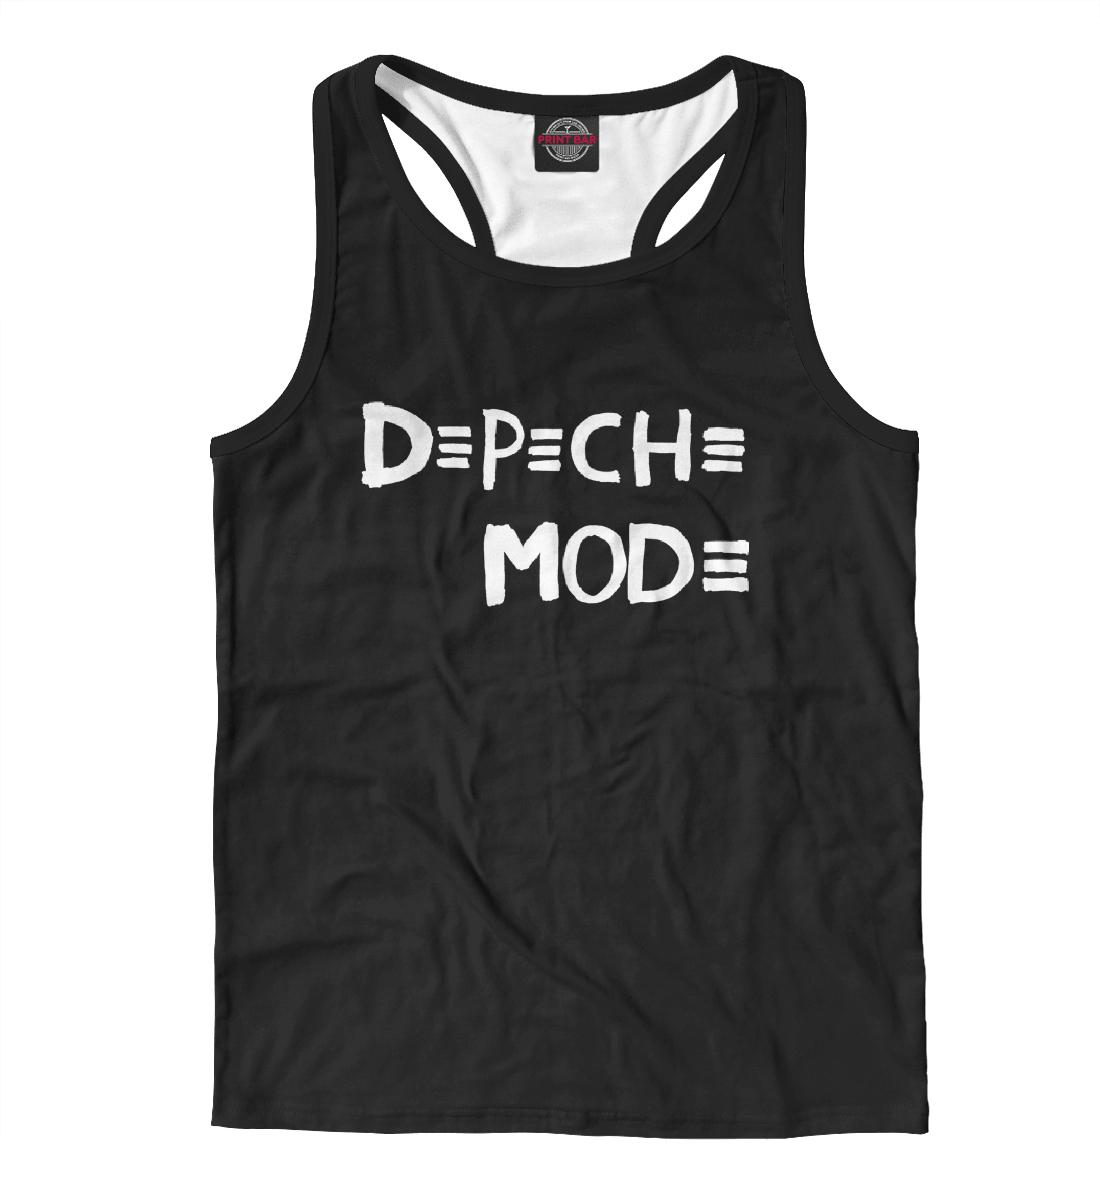 Купить Depeche Mode, Printbar, Майки борцовки, DPM-709535-mayb-2